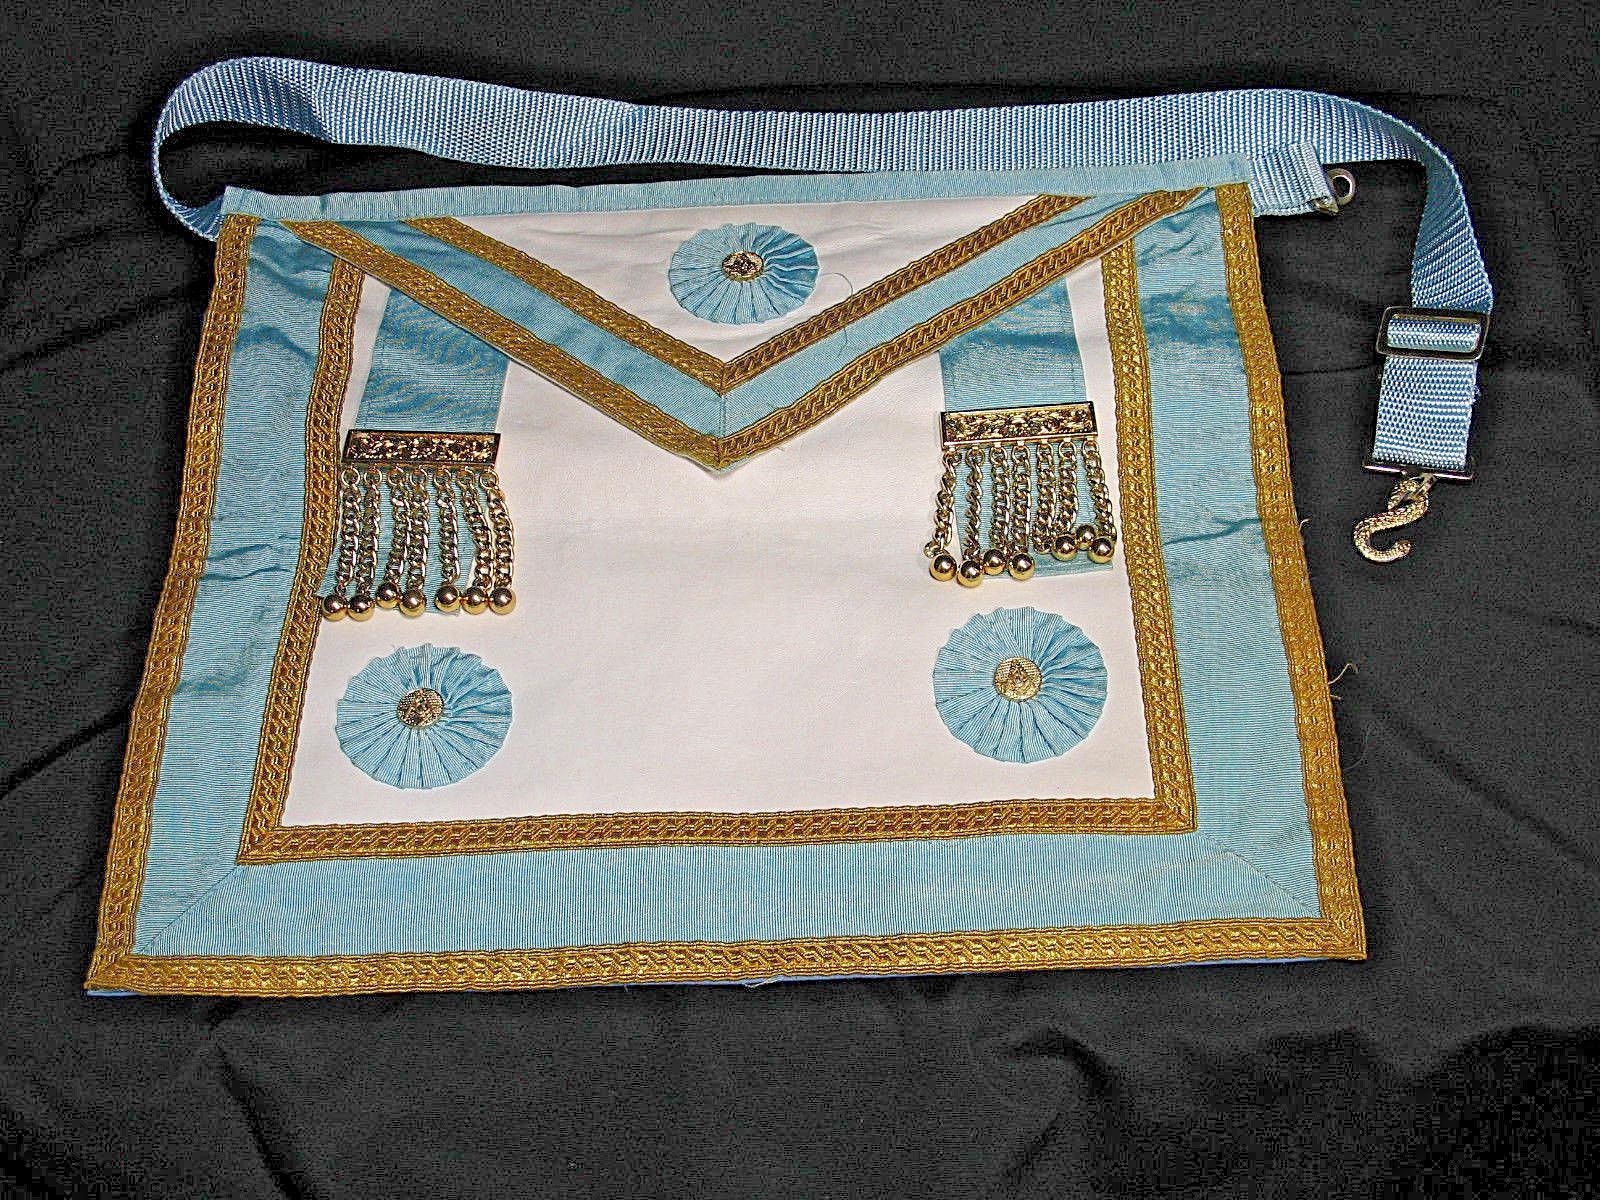 Vintage Masonic Master Mason Apron Regalia Blue White Gold Freemason  Ceremonial